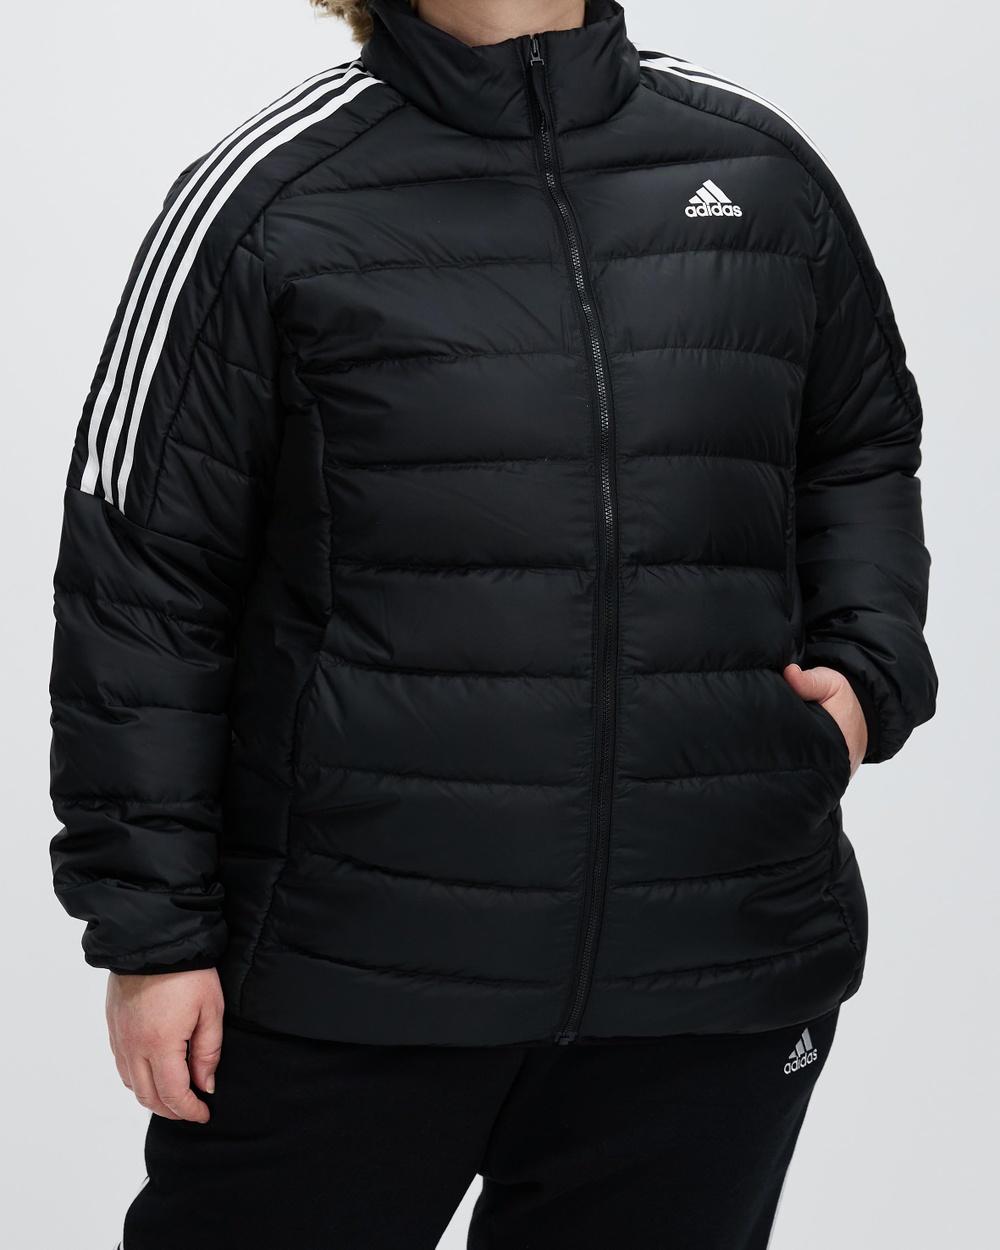 adidas Performance Essentials Light Down Jacket and Coats Black